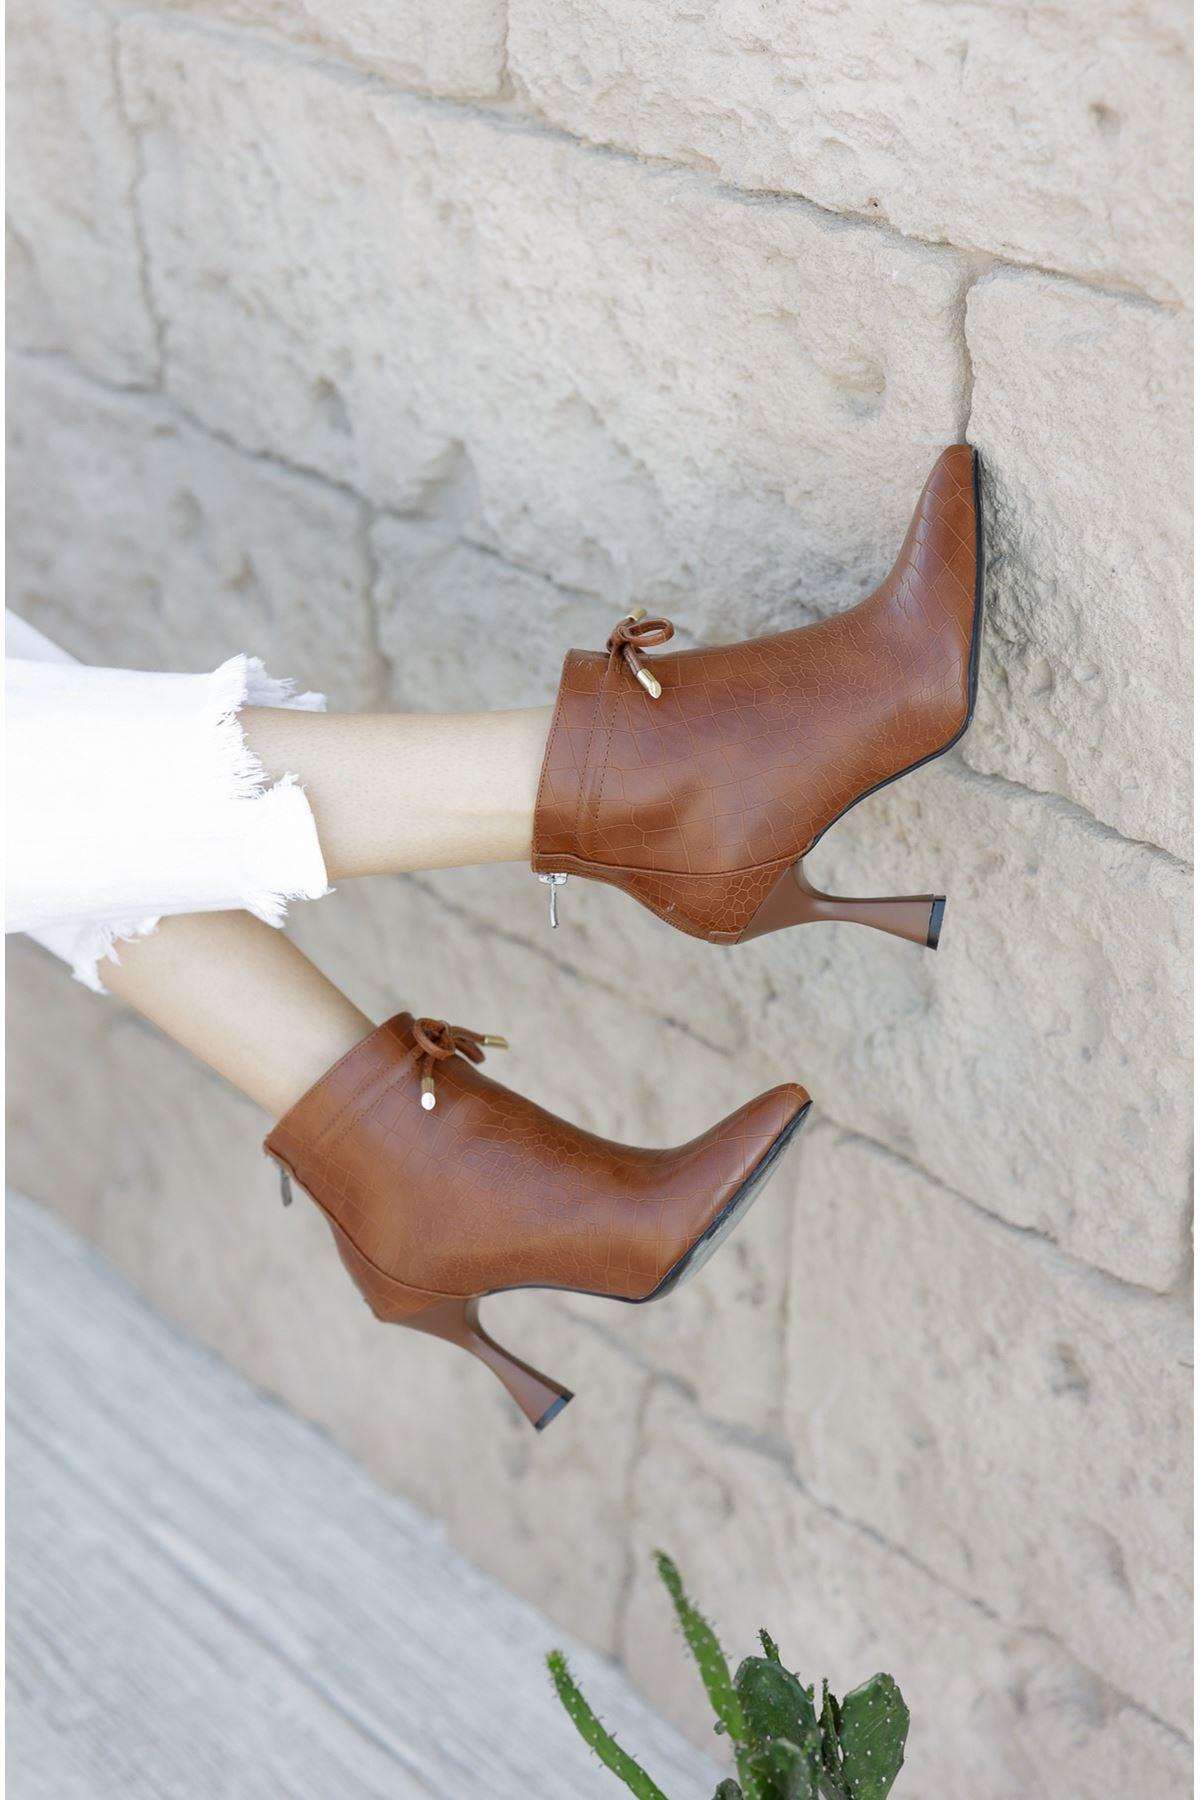 Kadın Minke Yüksek Kadeh Topuklu Taba Kroko Mat Deri  Bot